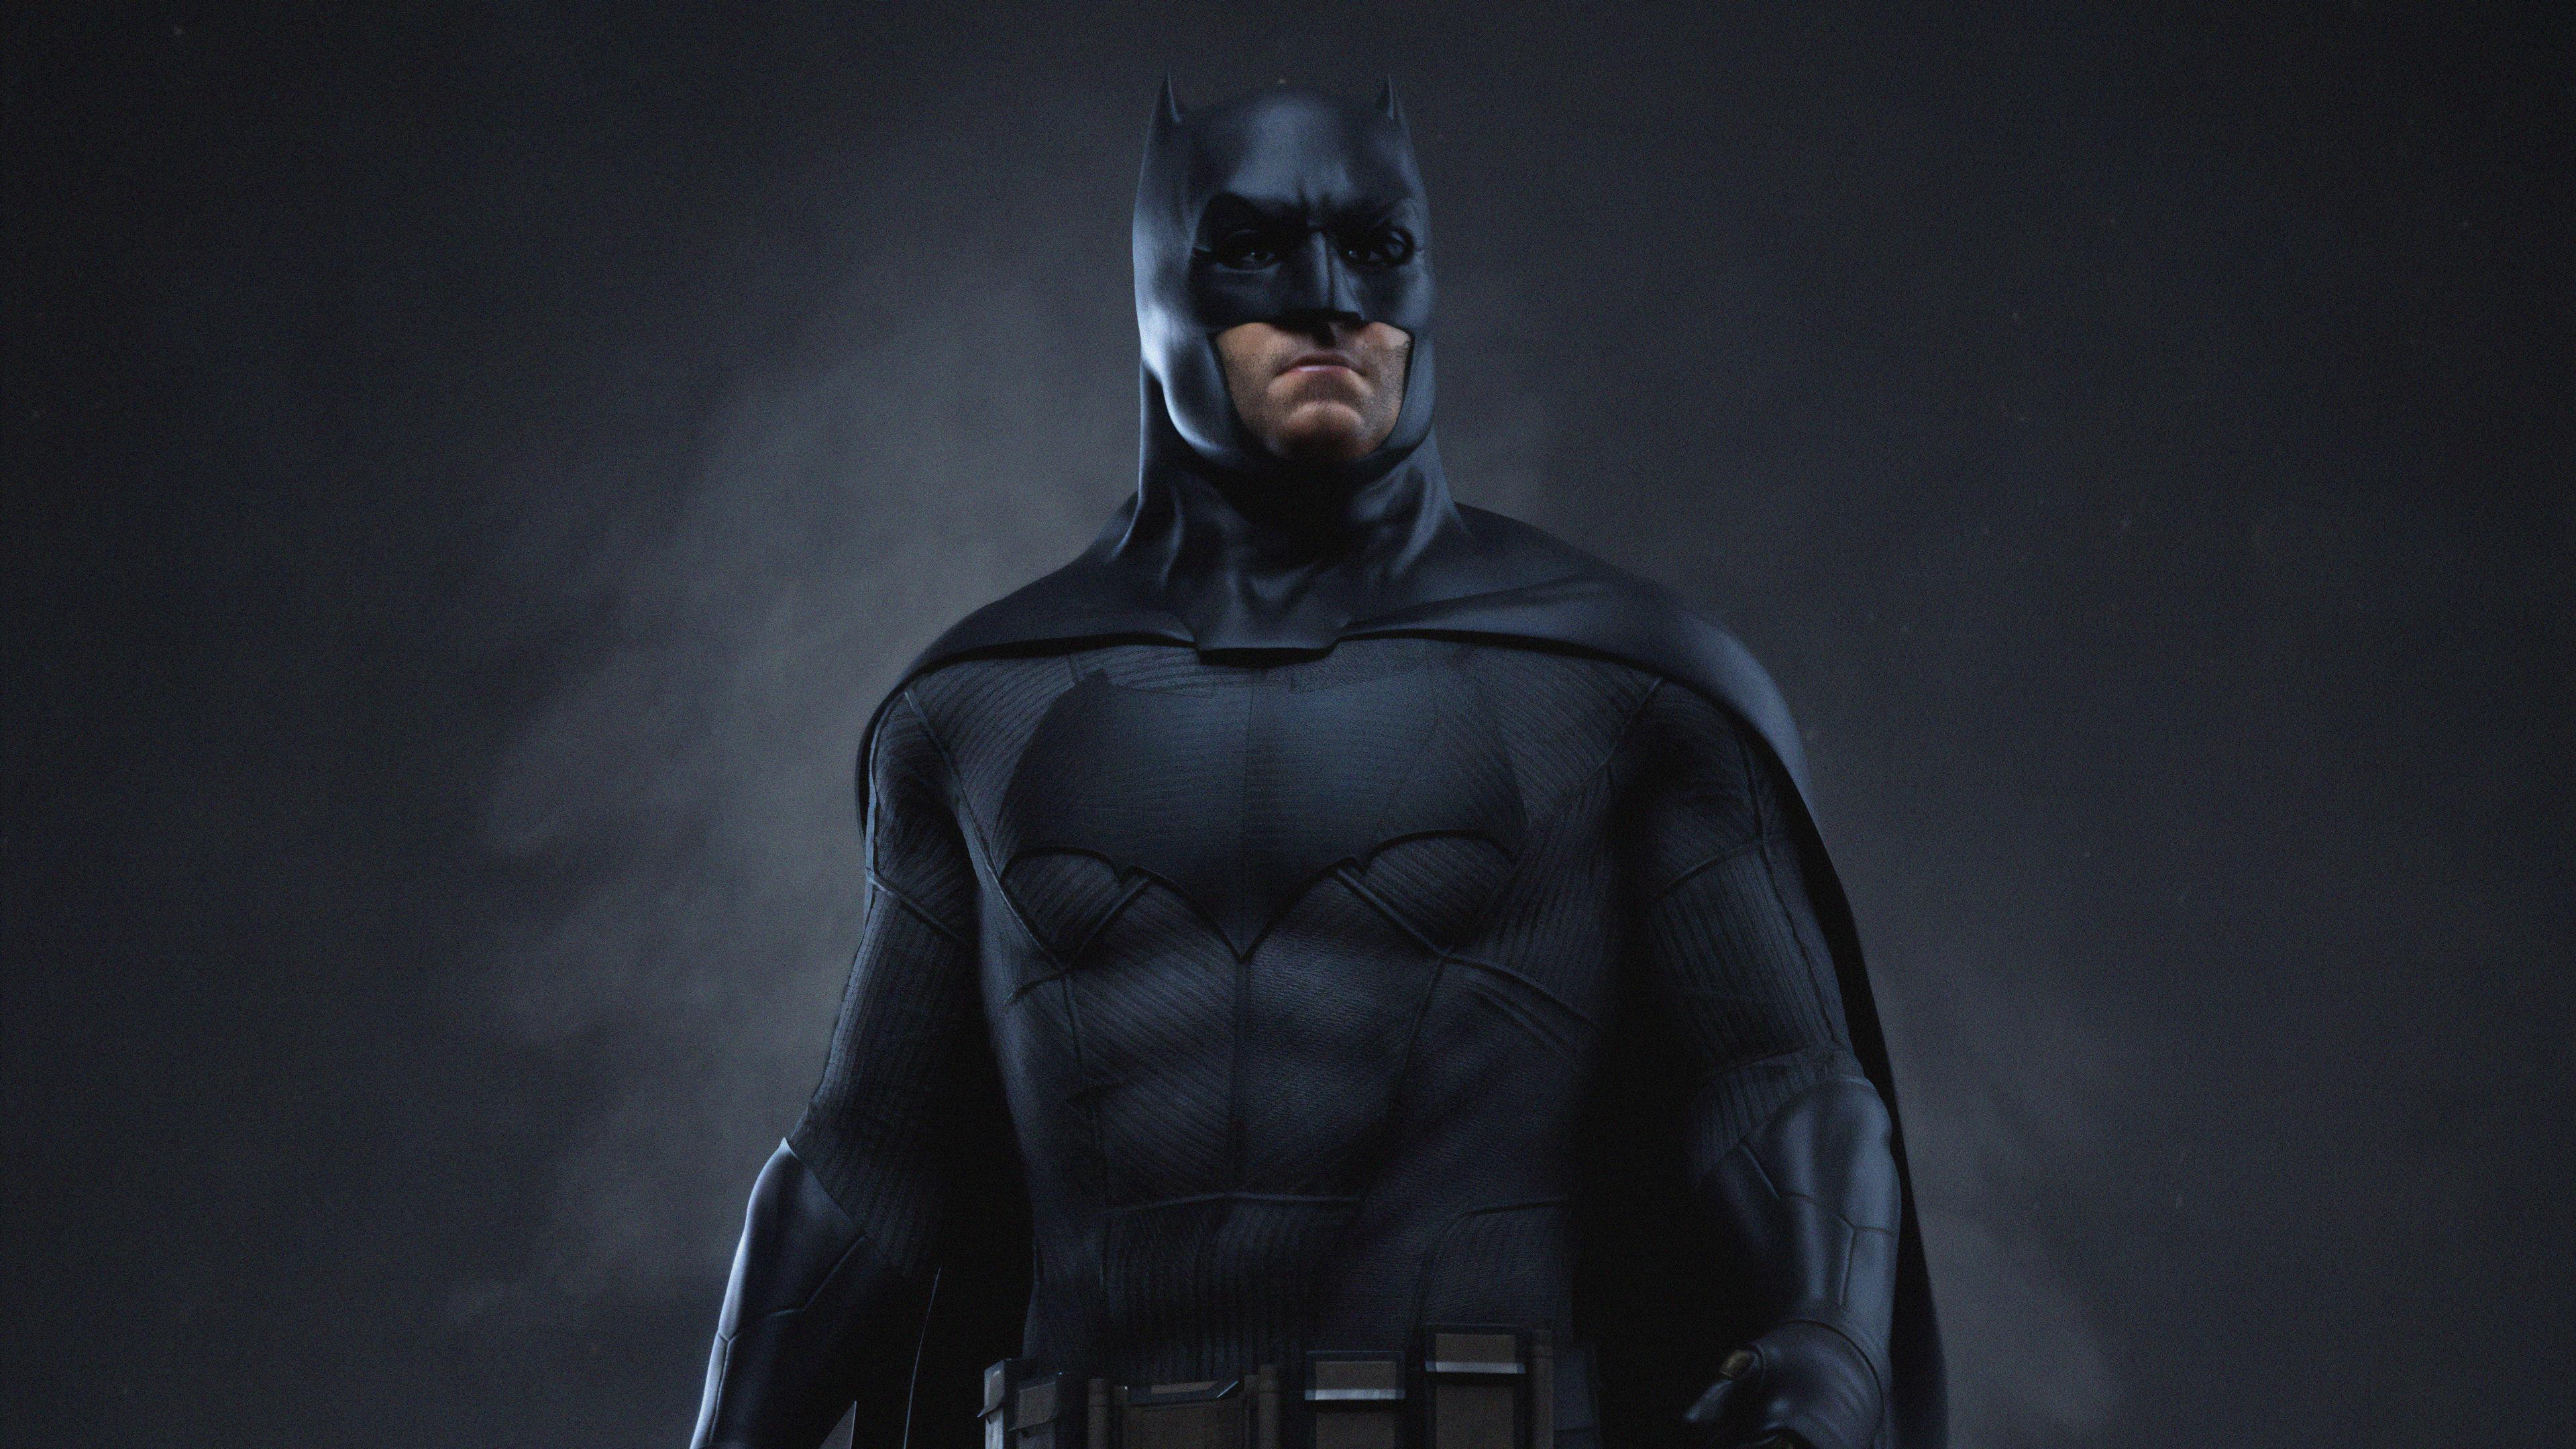 4k batman 2019 new 1563220412 - 4k Batman 2019 New - superheroes wallpapers, hd-wallpapers, digital art wallpapers, batman wallpapers, artwork wallpapers, 4k-wallpapers